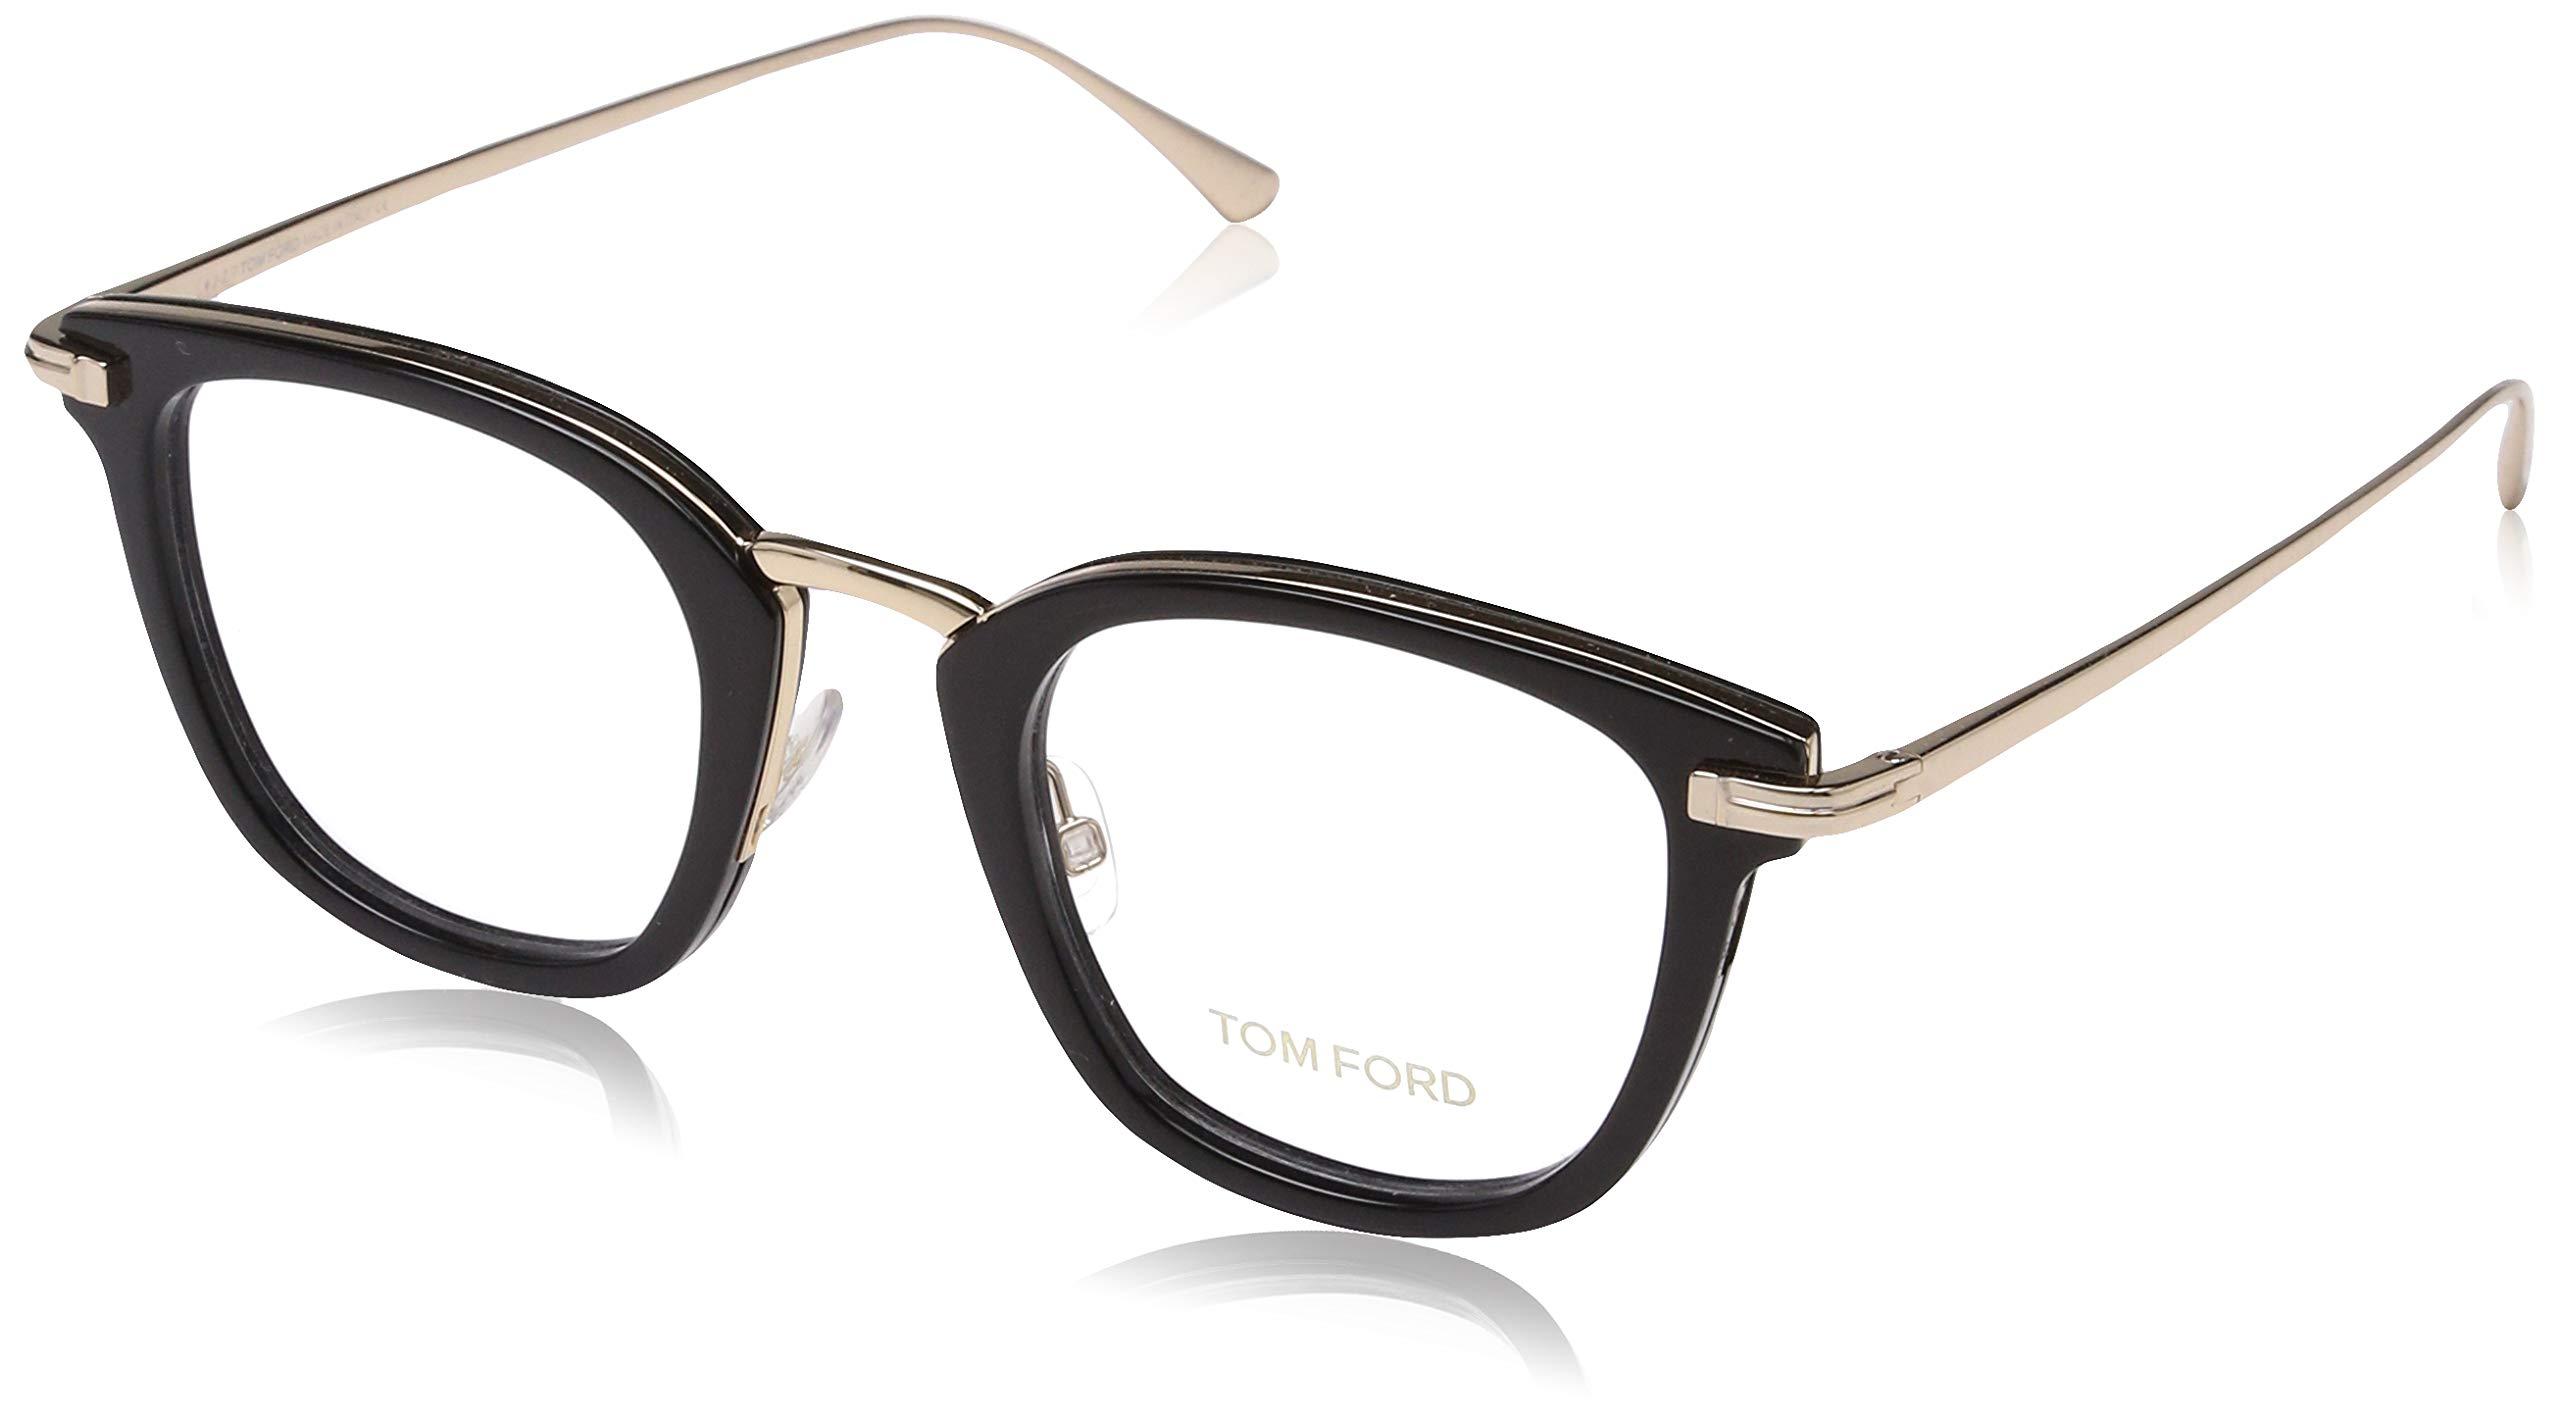 Eyeglasses Tom Ford FT 5496 001 shiny black by Tom Ford